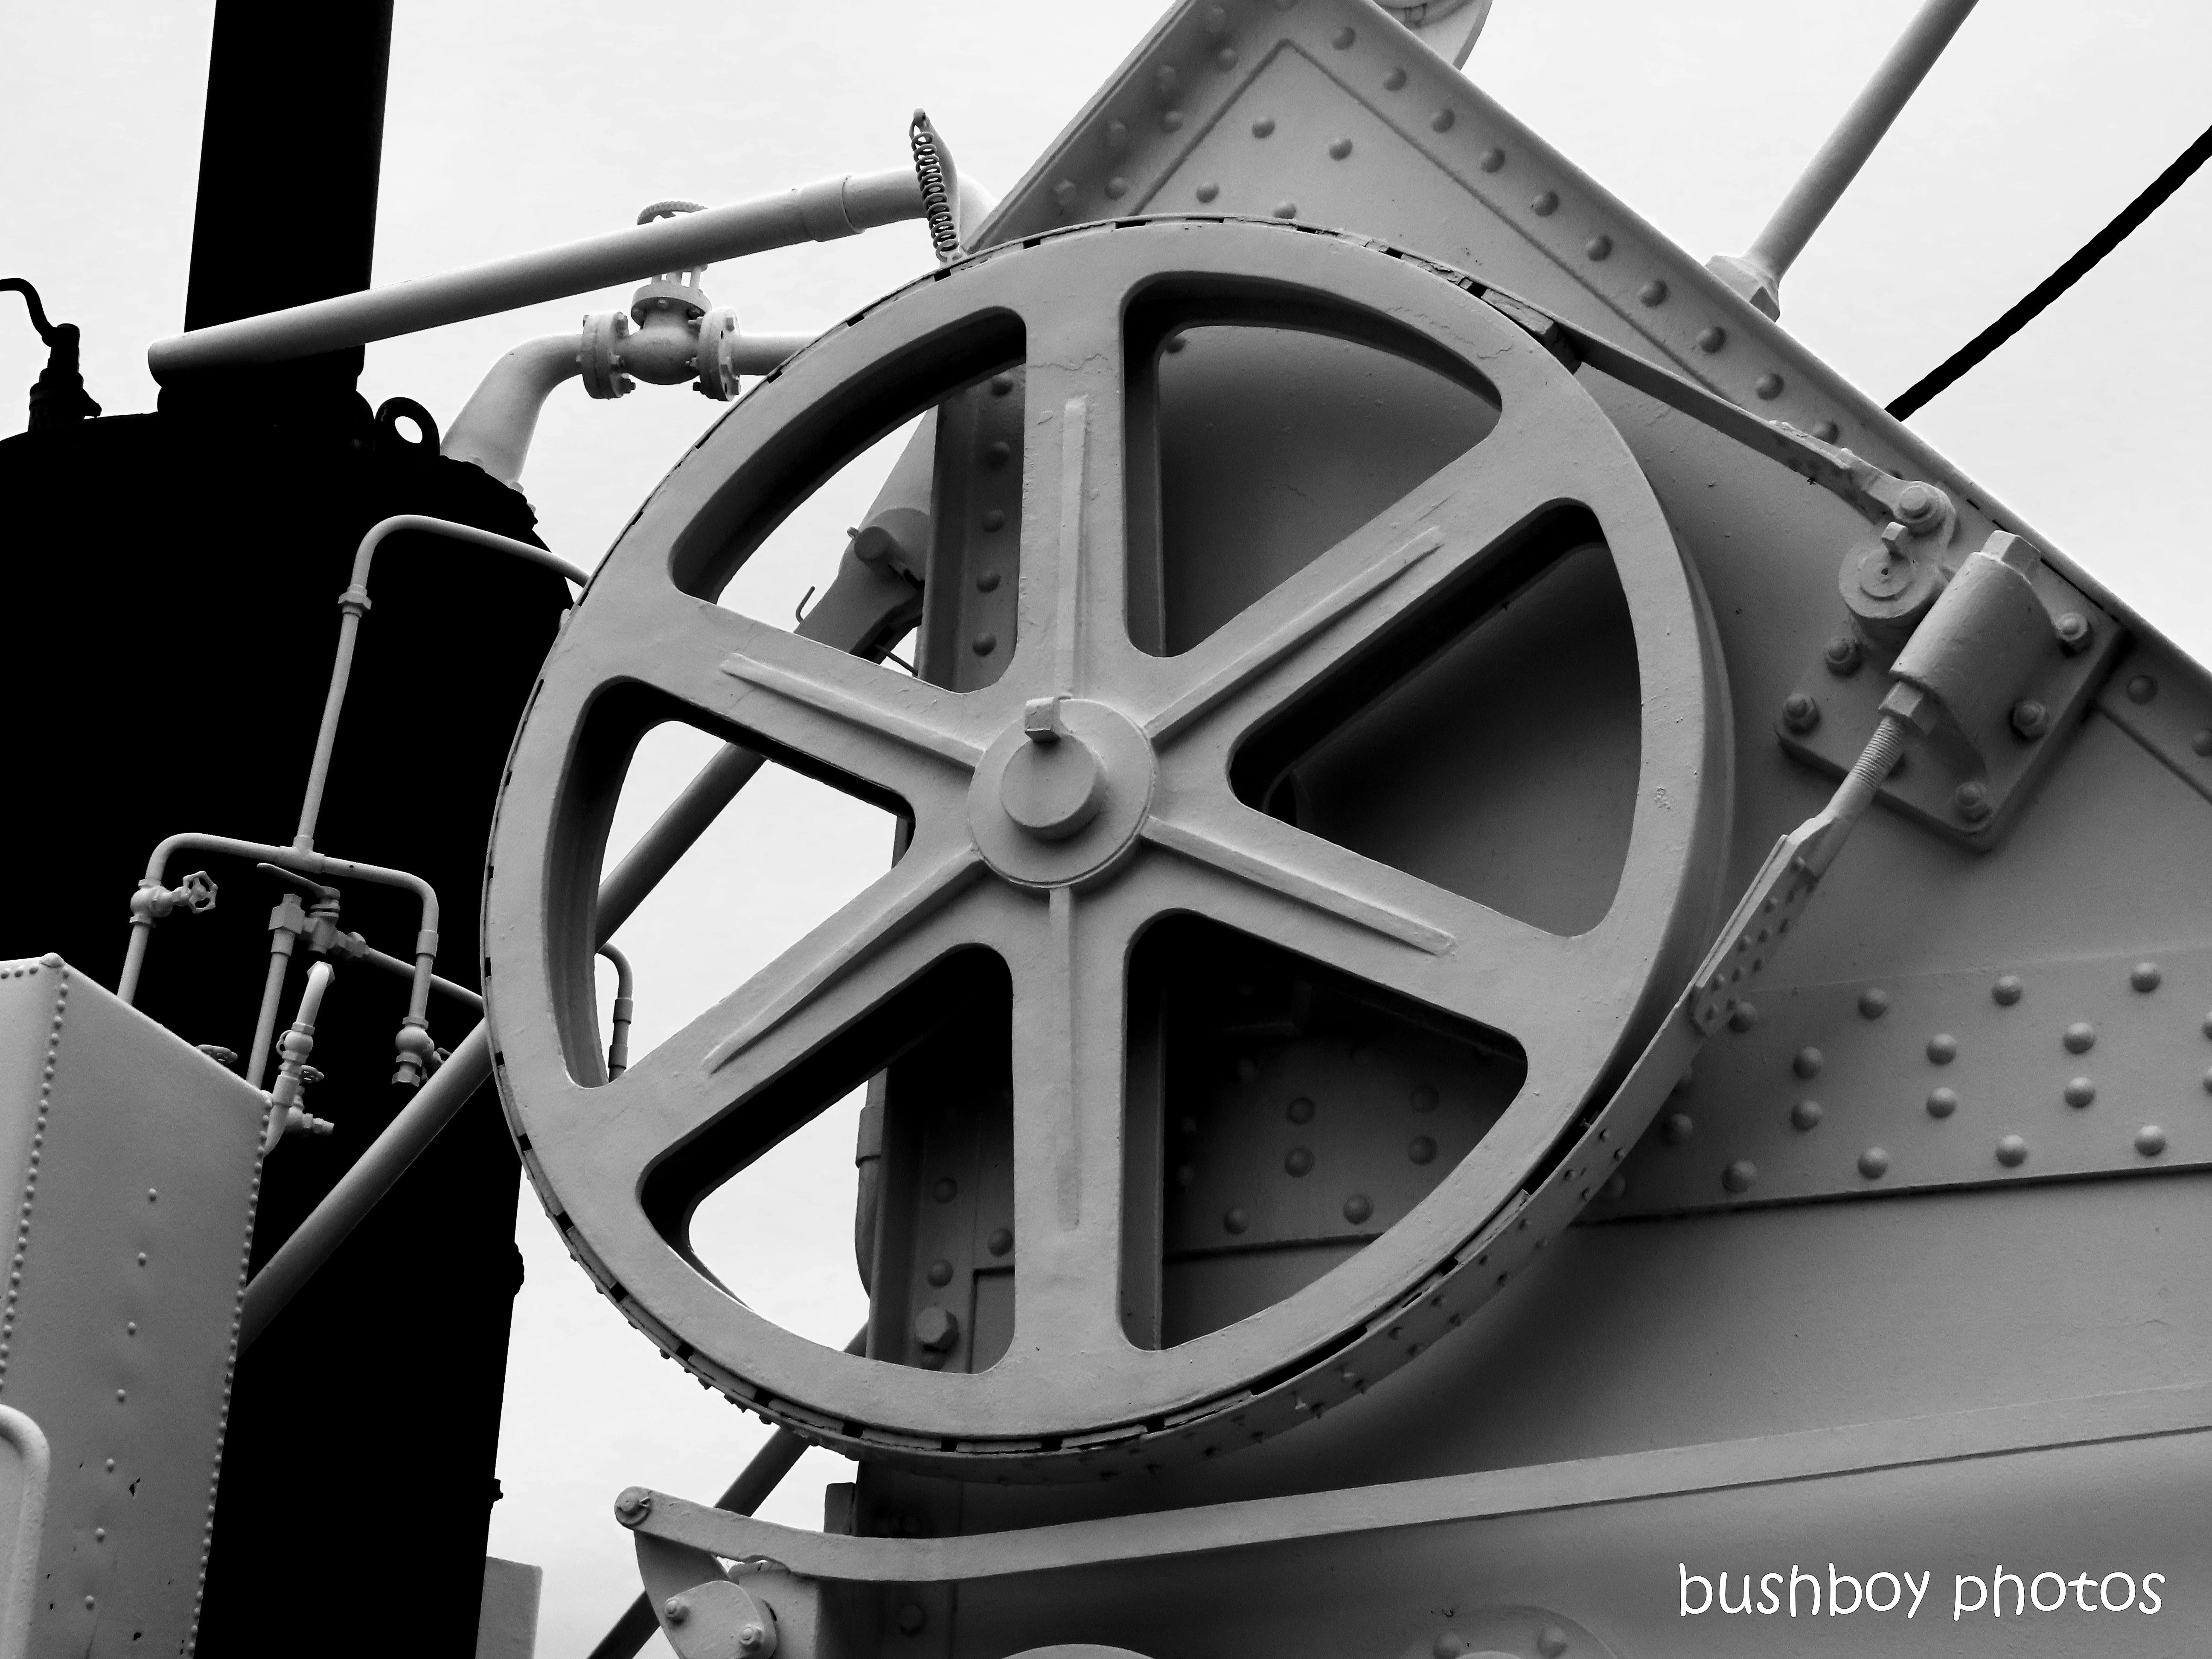 20200207_blog_challenge_blackandwhite_shapes_wheel_rivets_industry